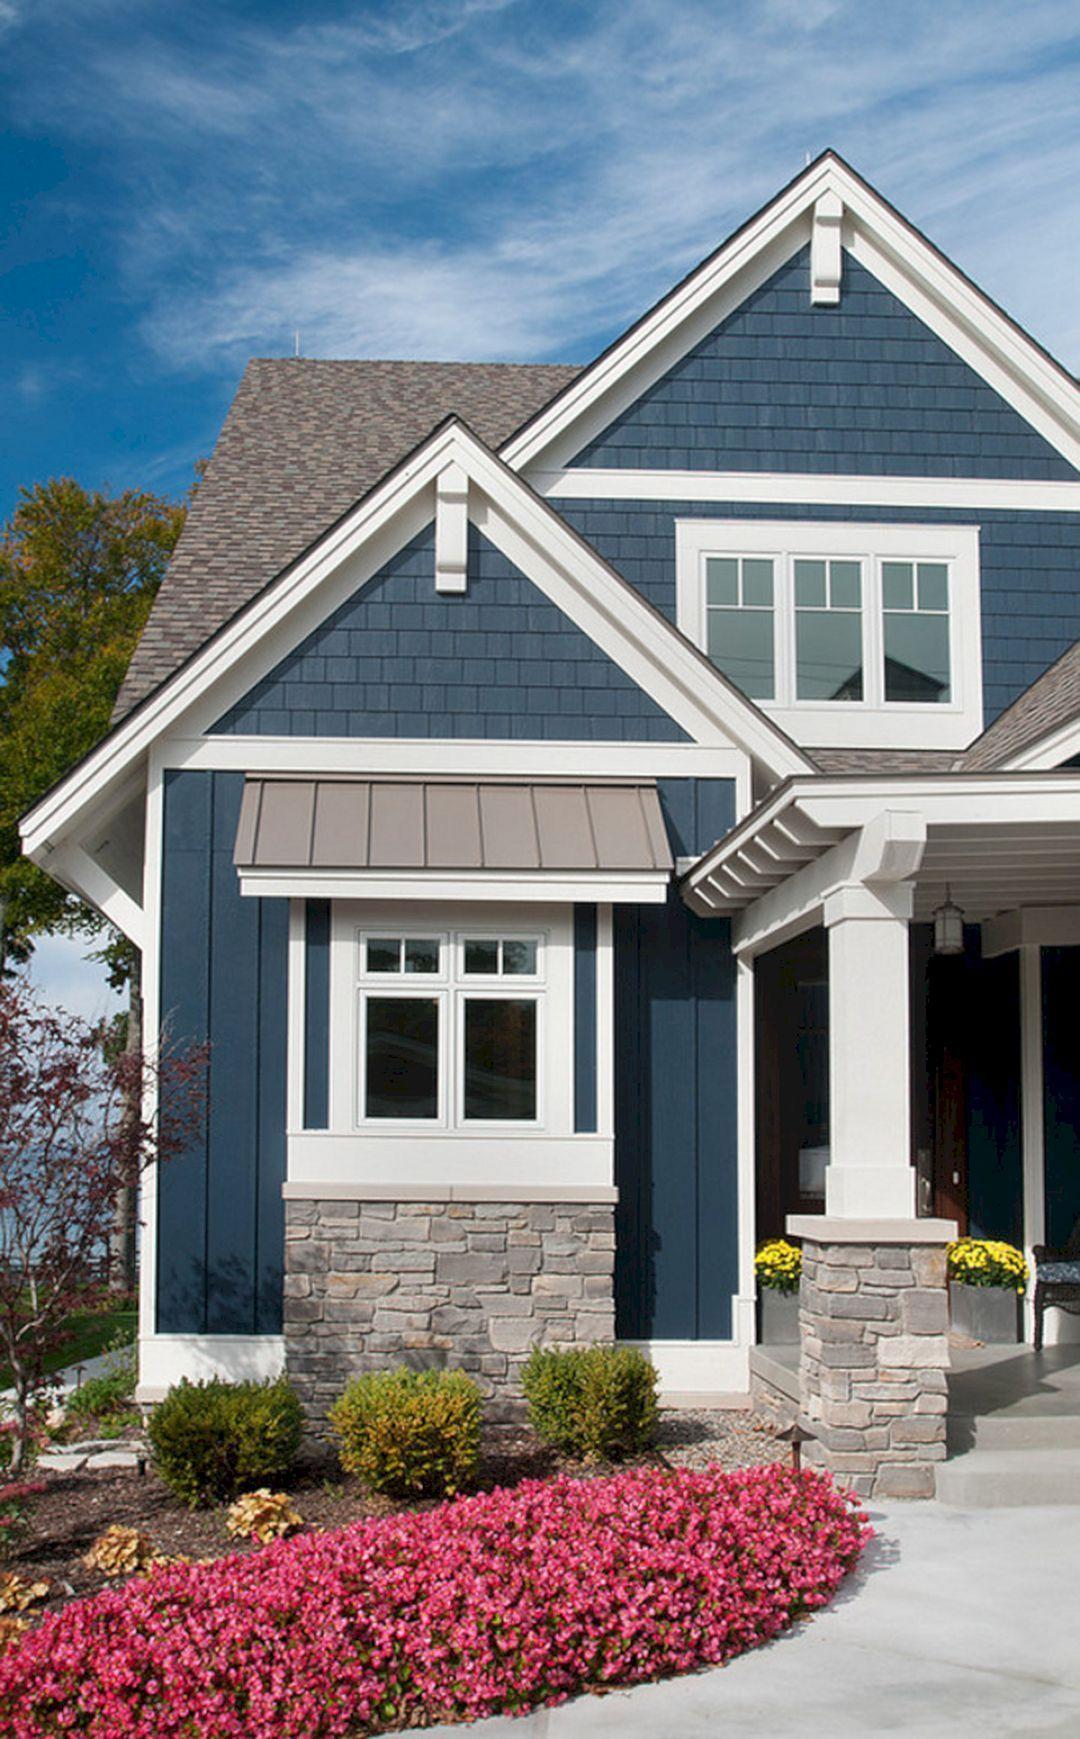 Rustic Exterior Home Paint Colors Idea Rustic Exterior Home Paint